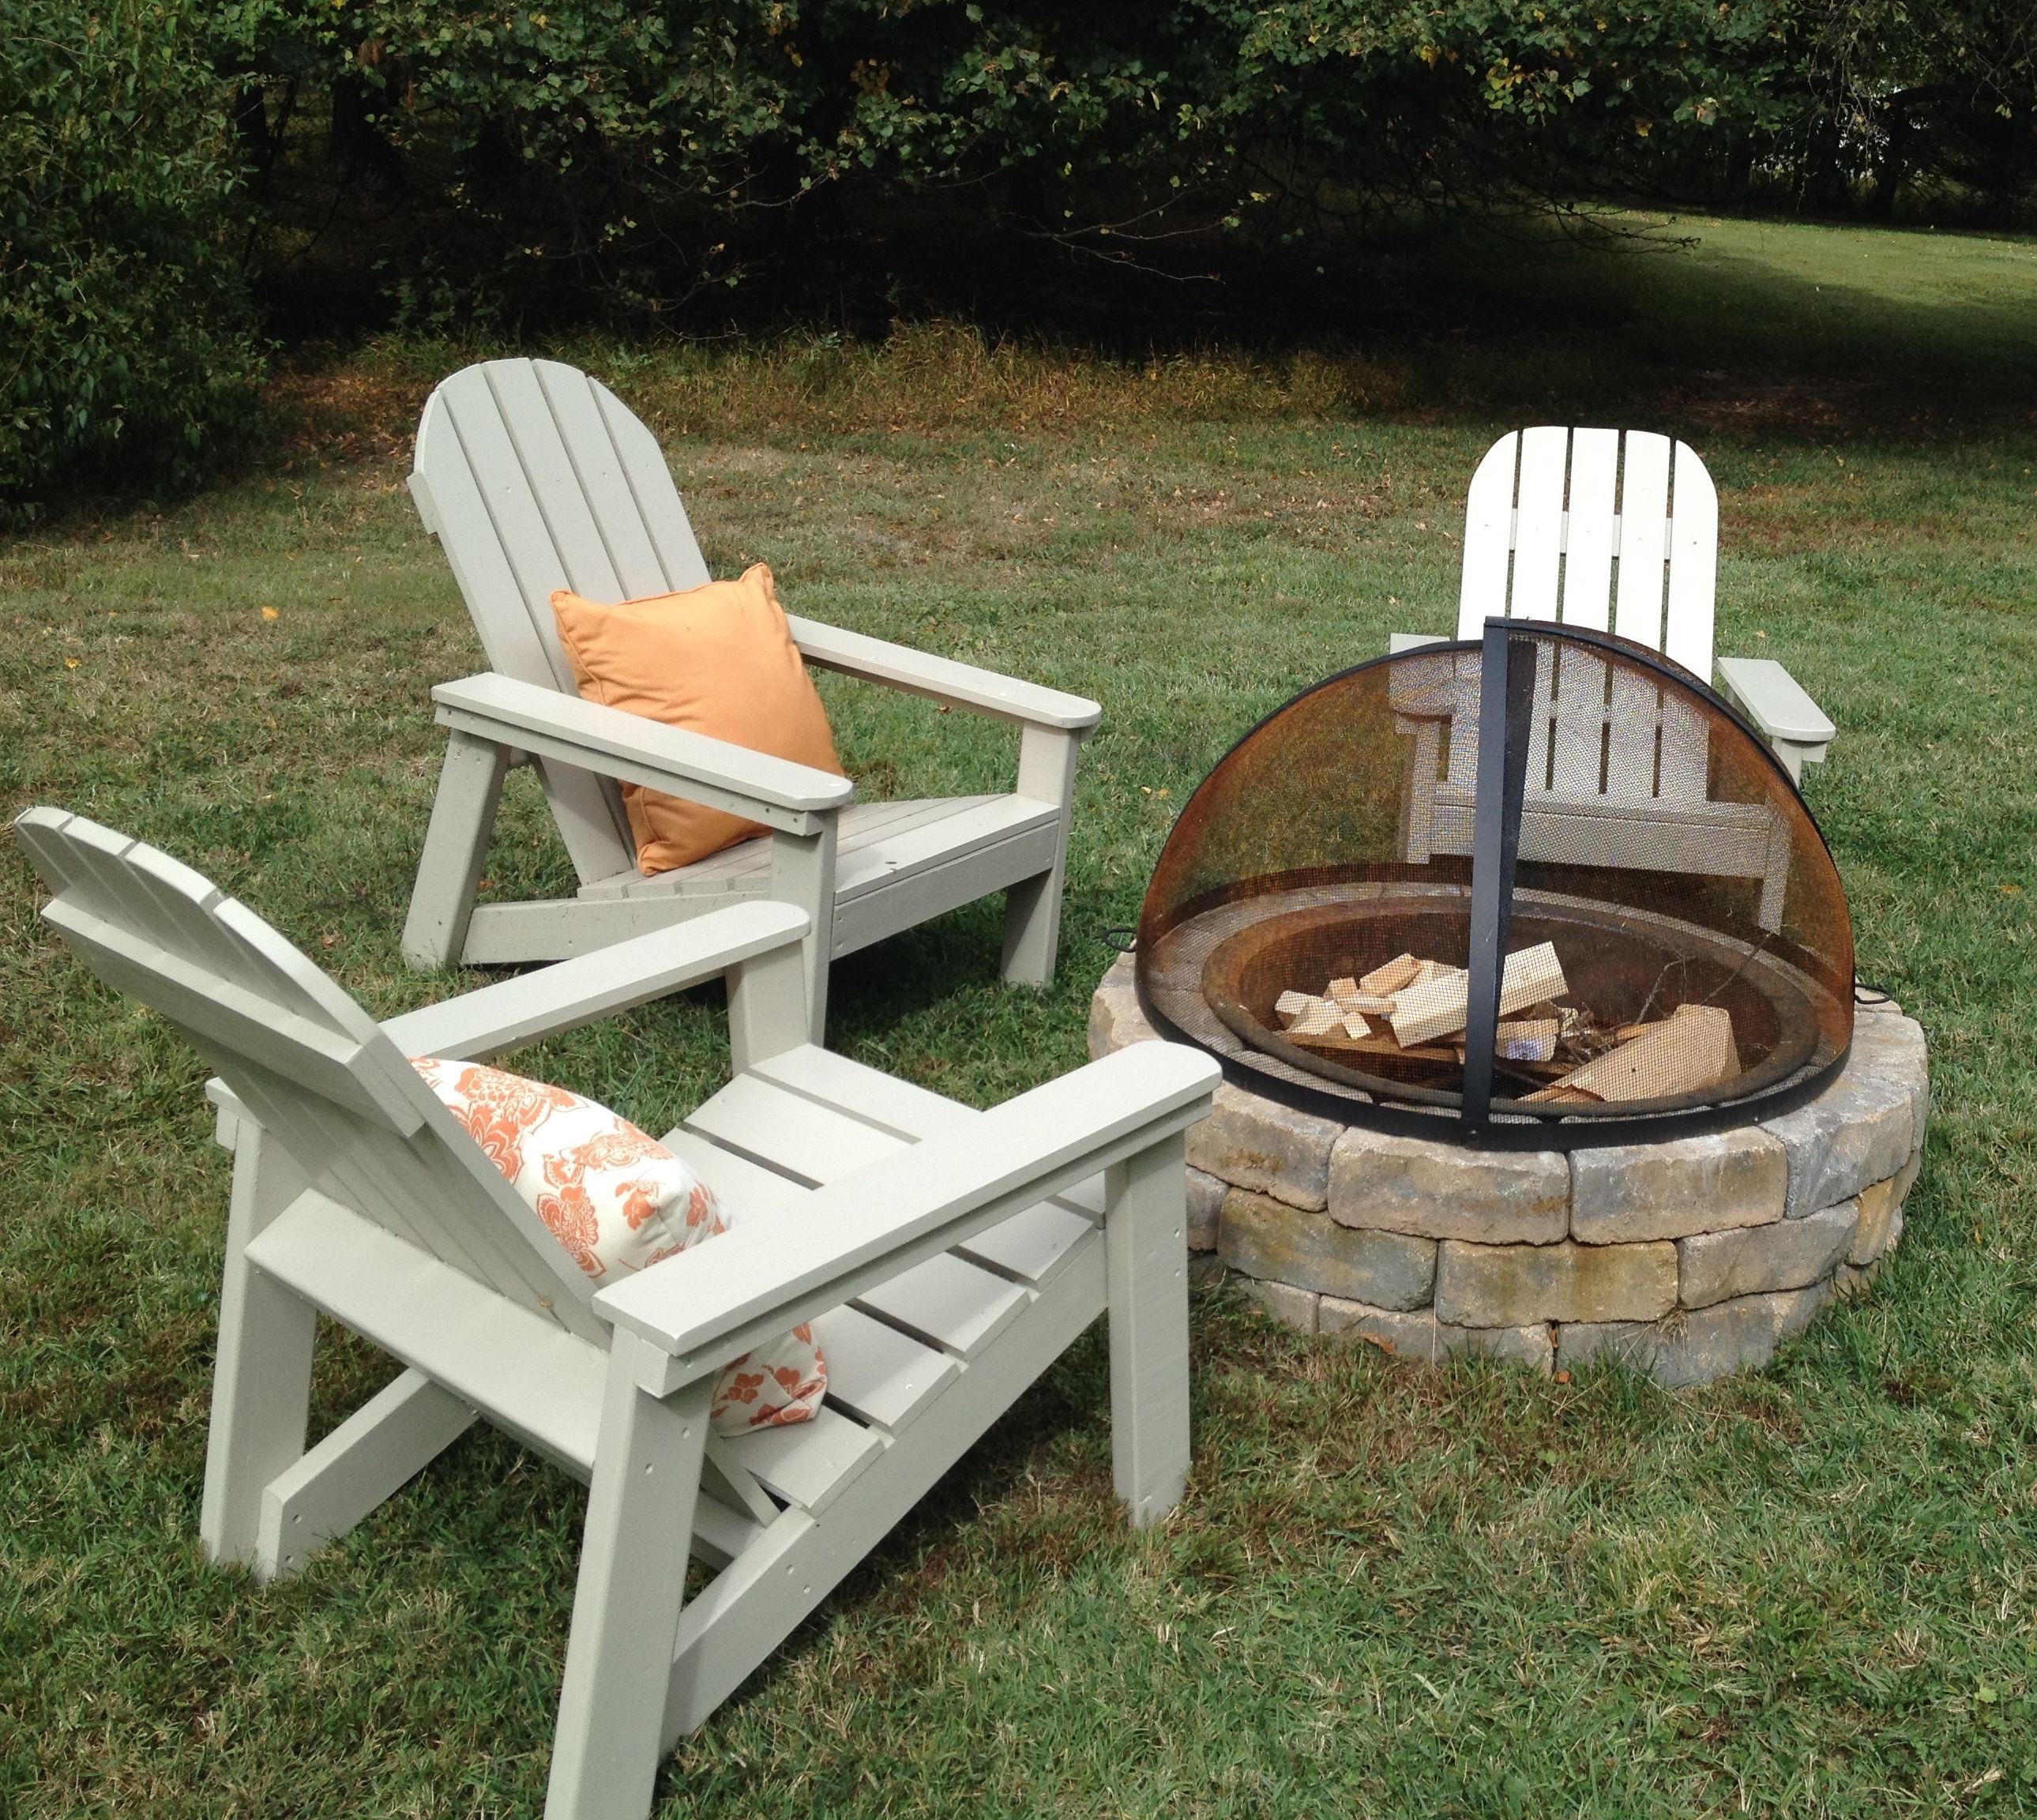 Ana White Adirondack Chair DIY Projects Adirondack